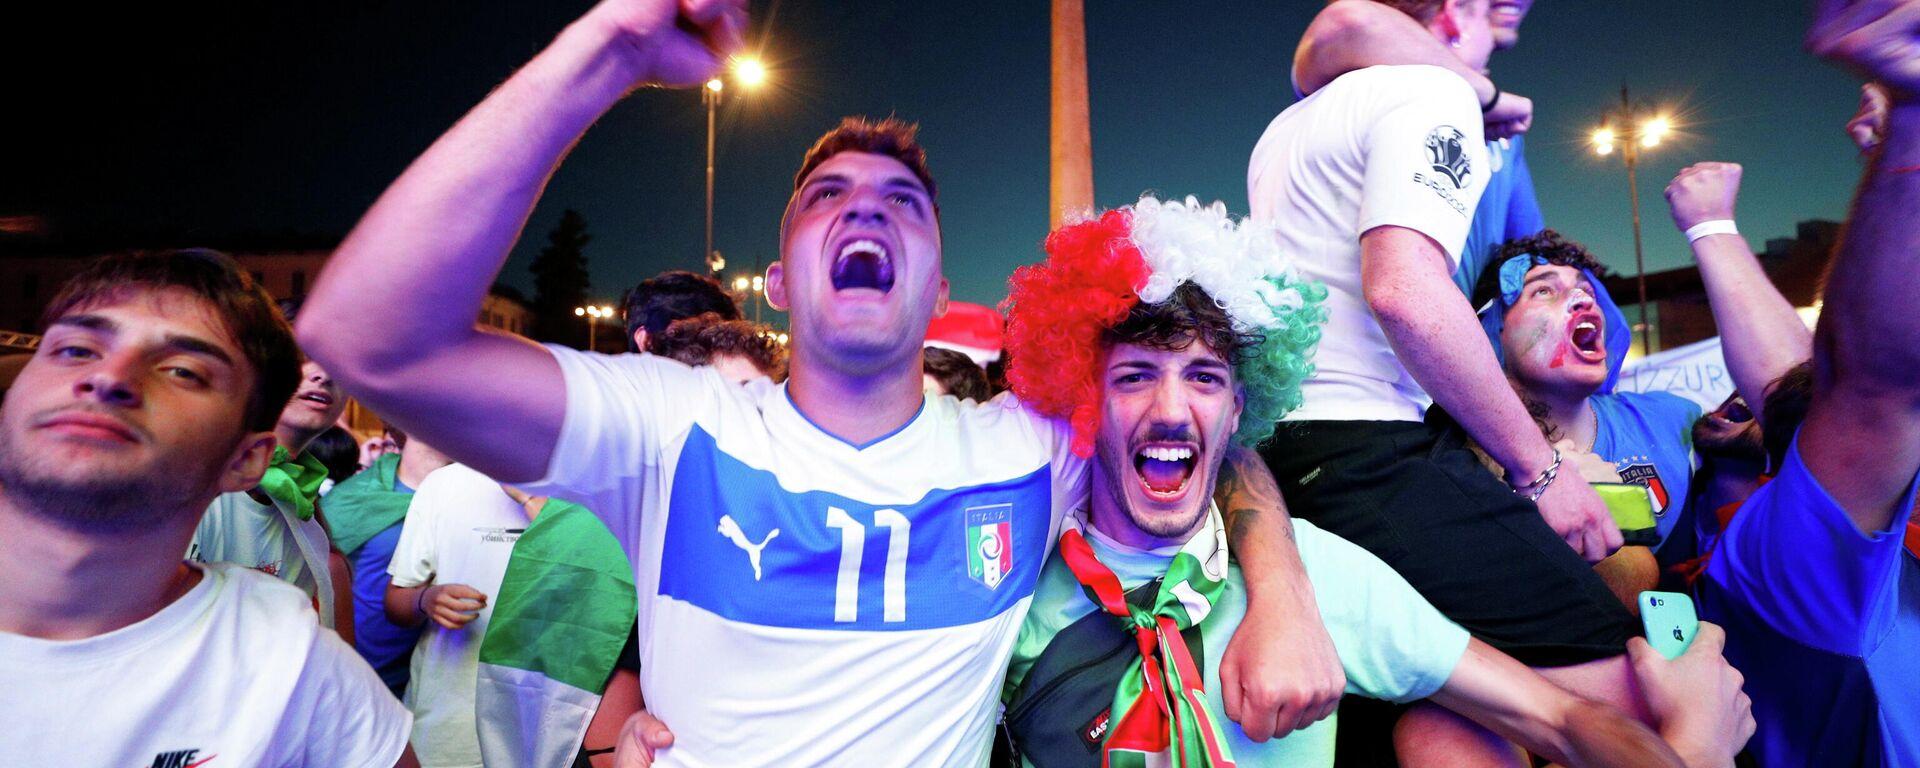 Unos hinchas de Italia durante la Eurocopa 2020 - Sputnik Mundo, 1920, 06.07.2021